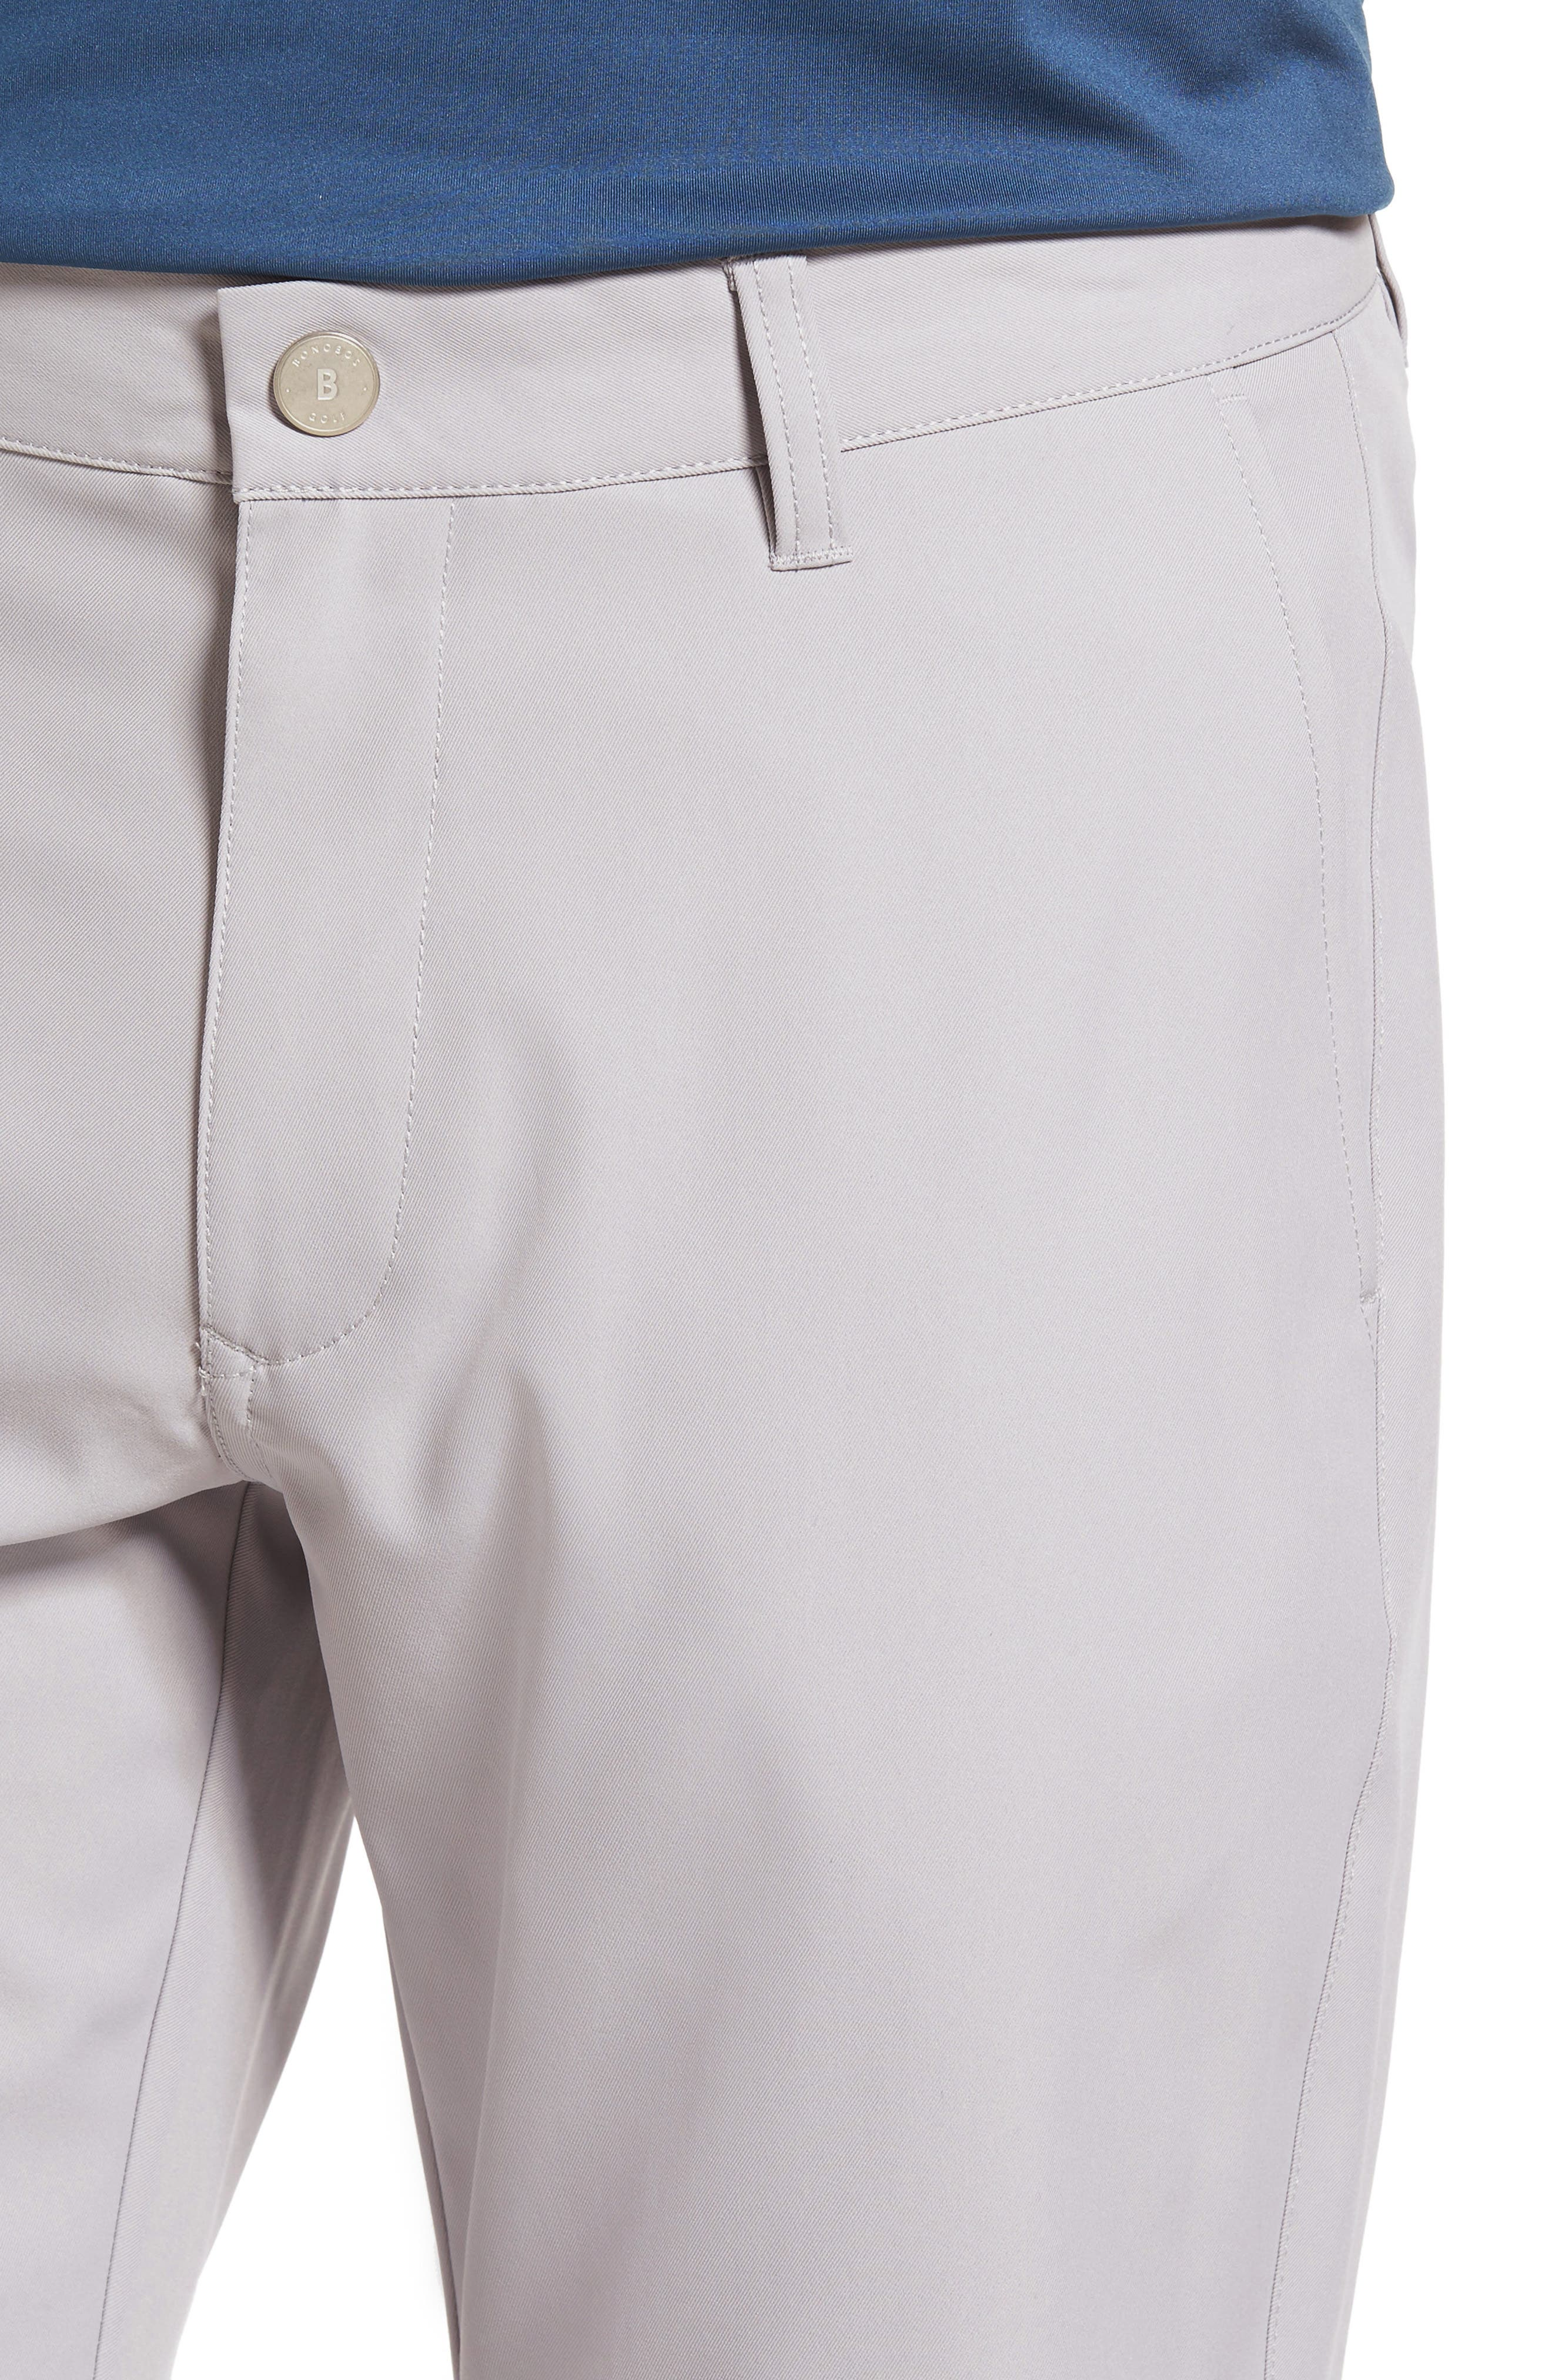 Highland Slim Fit Golf Pants,                             Alternate thumbnail 4, color,                             LIGHT GREY